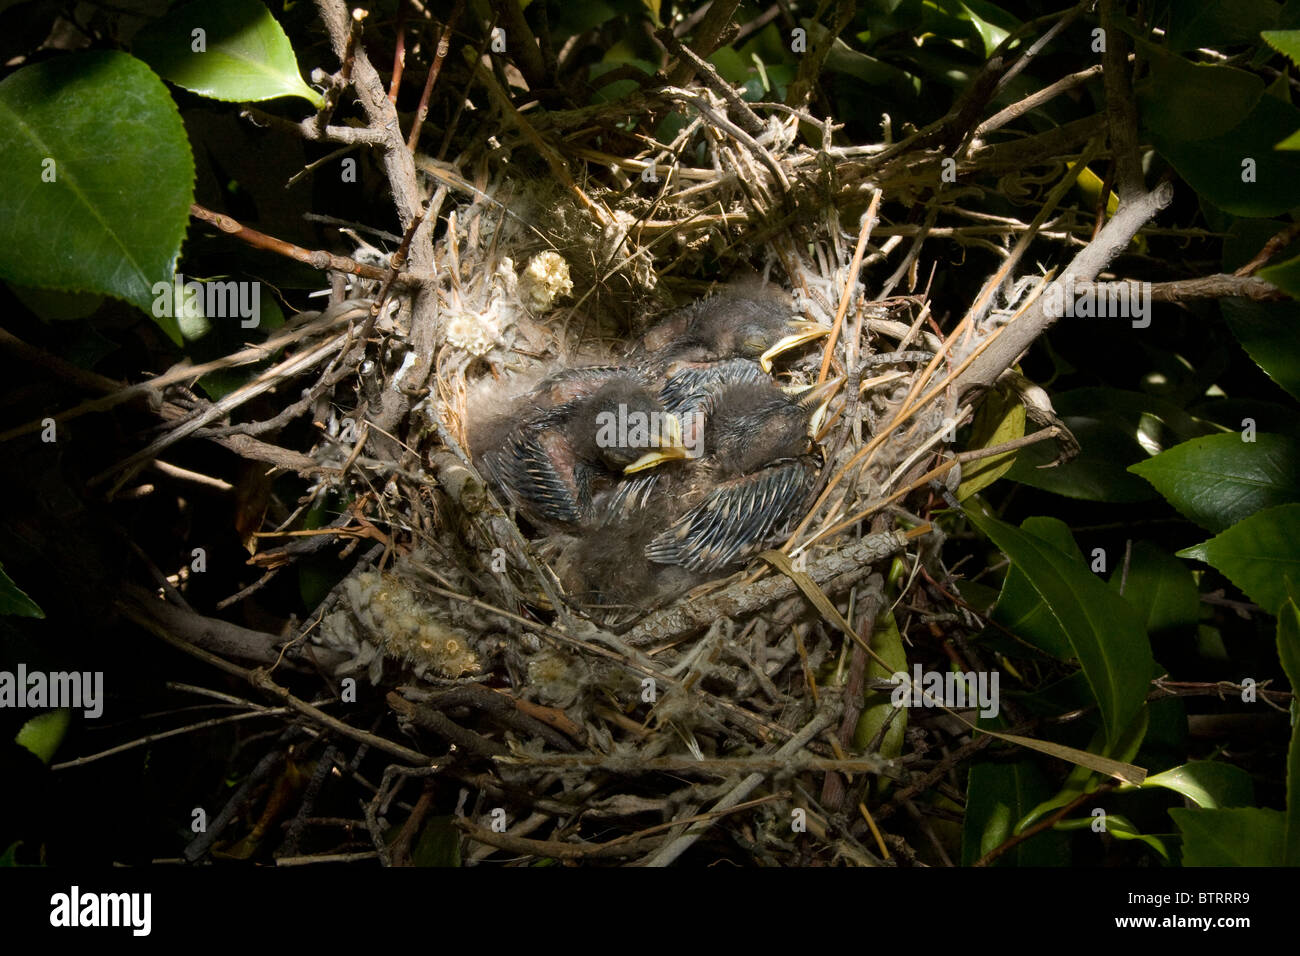 Three Very Young Northern Mockingbird Chicks in Nest Stock Photo